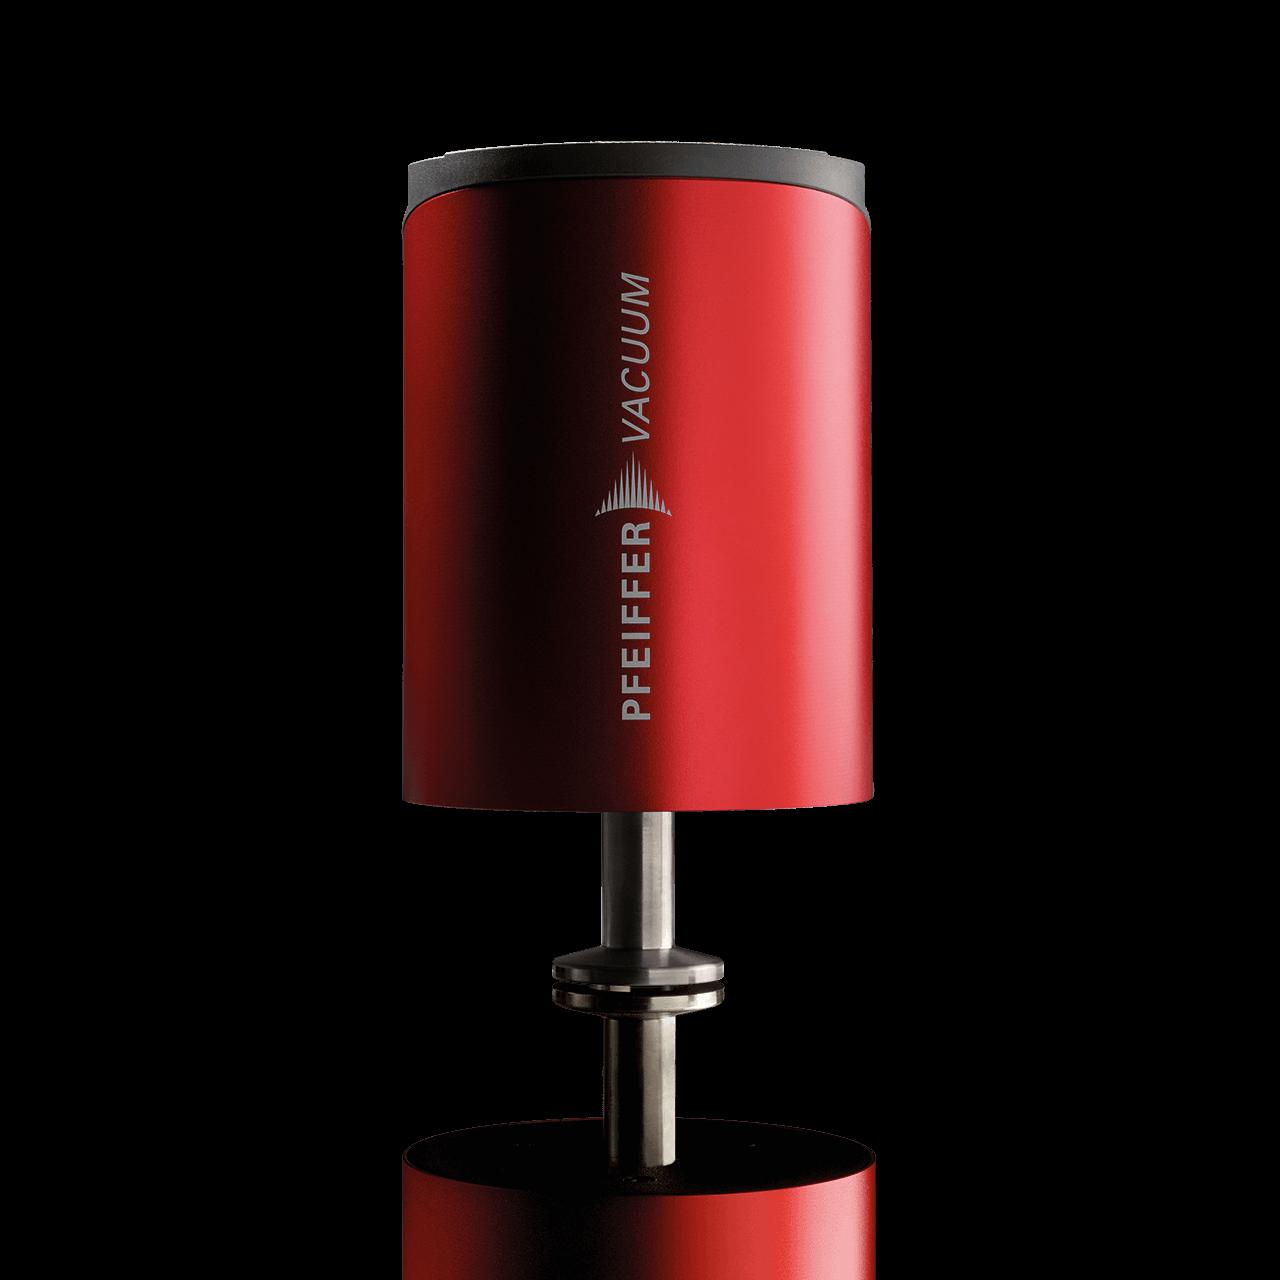 Messgeräte - Pfeiffer Vacuum